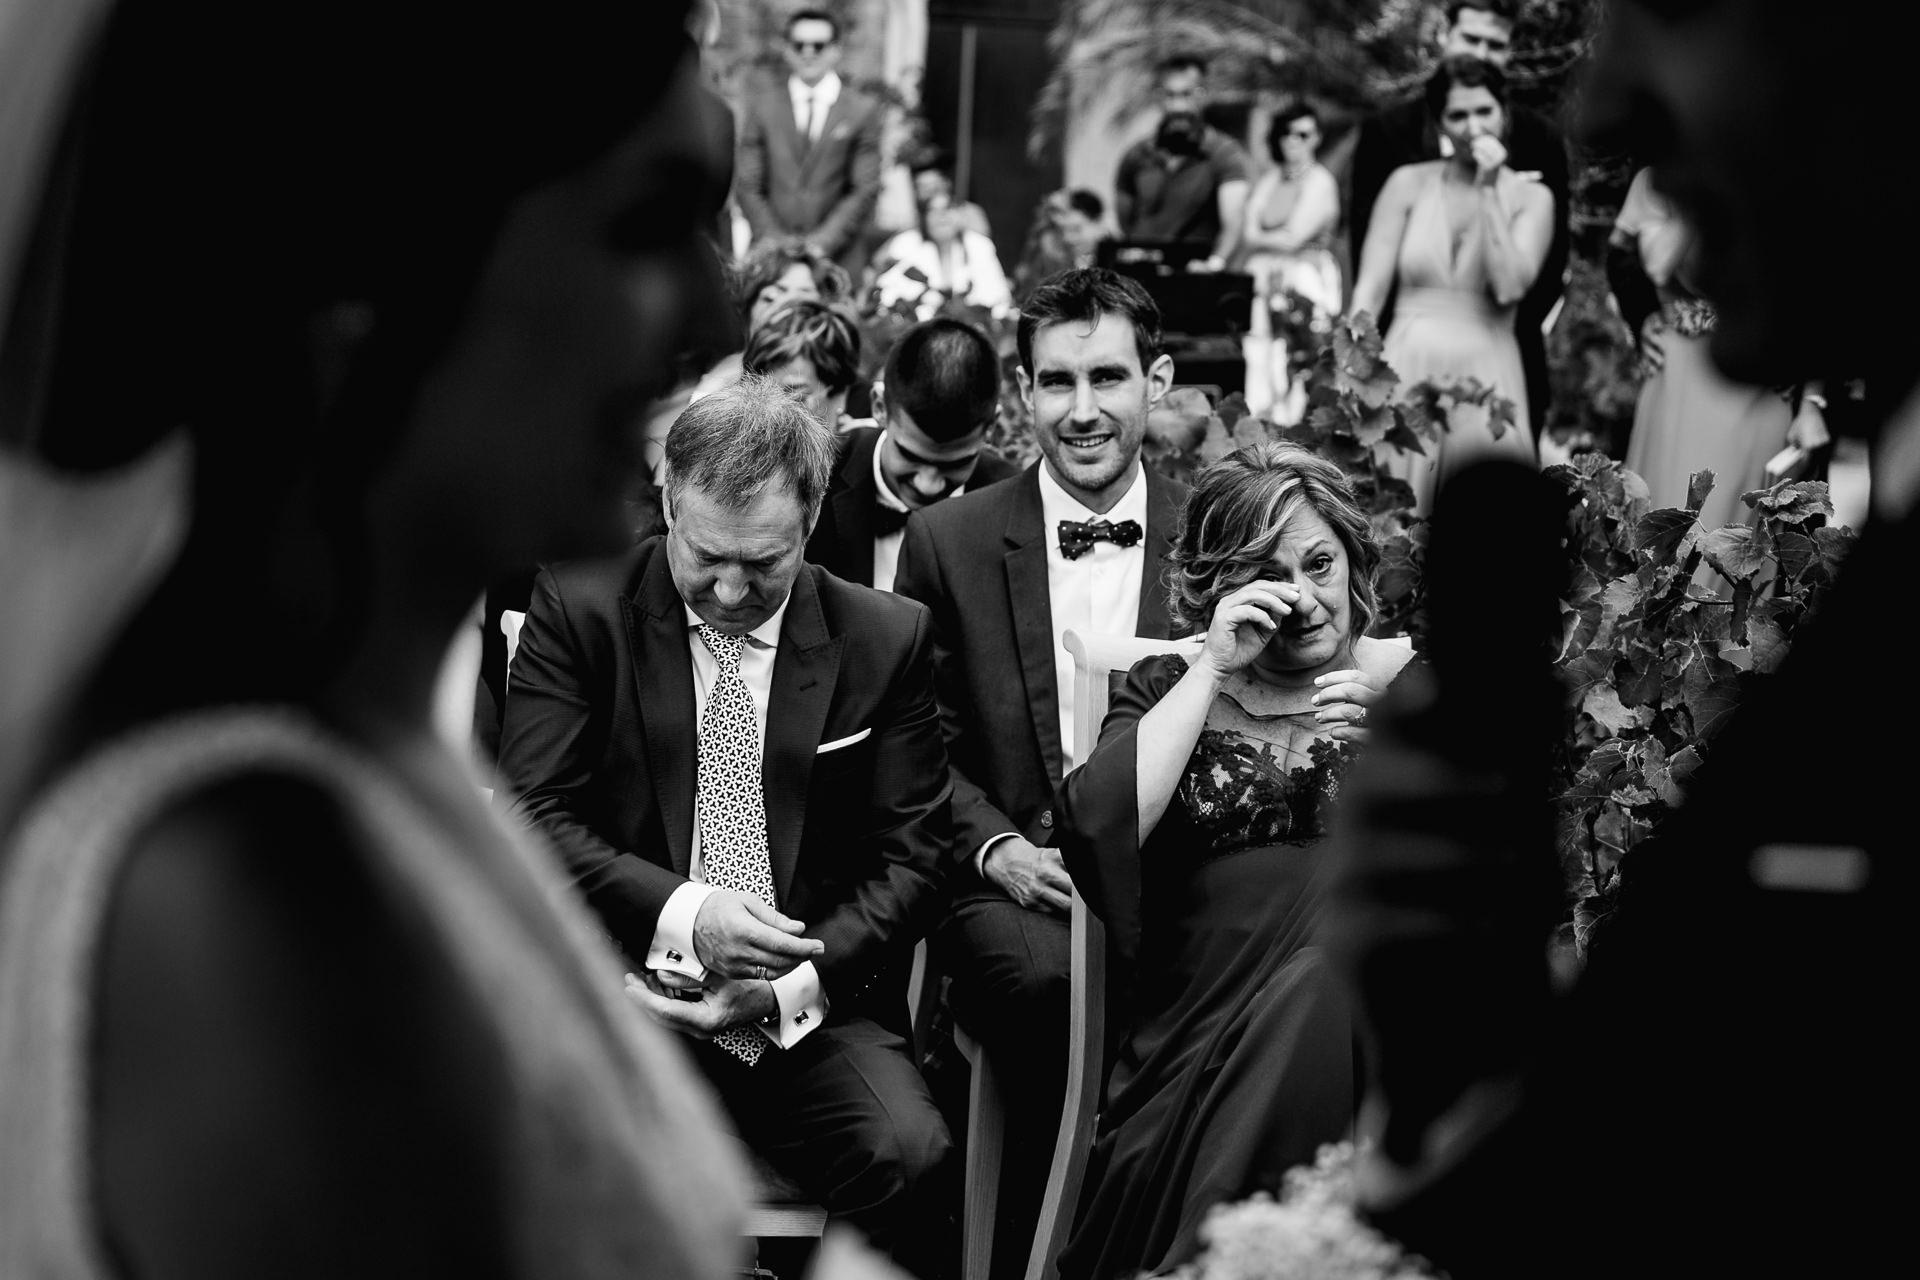 boda civil eguren ugarte larioja 144137